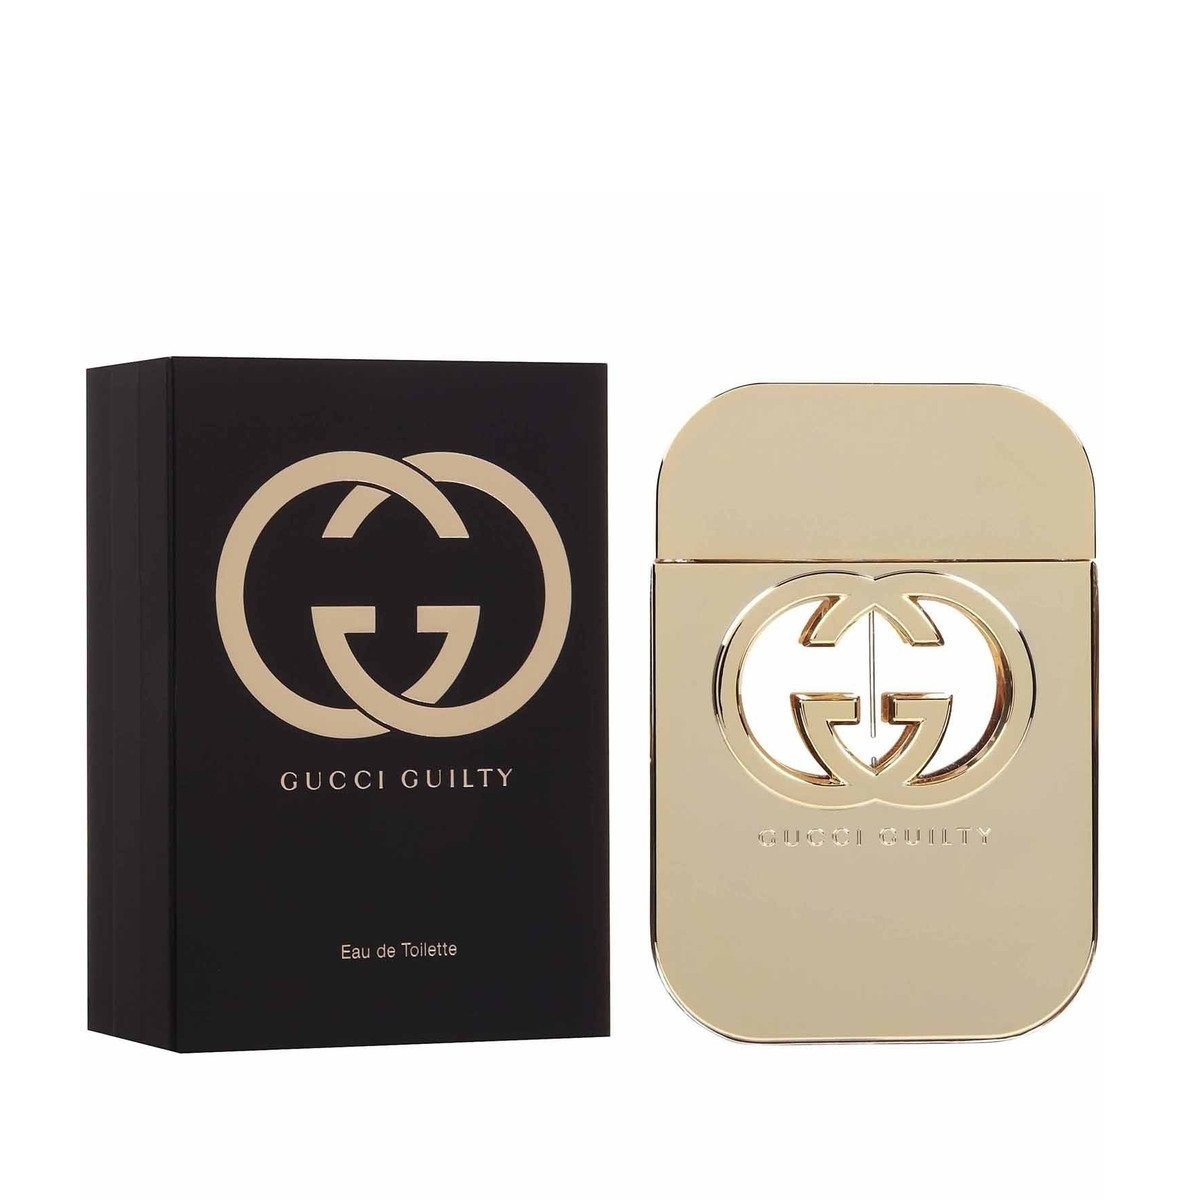 Guilty by Gucci  for Women, Eau de Toilette Spray, 2.5 Ounce